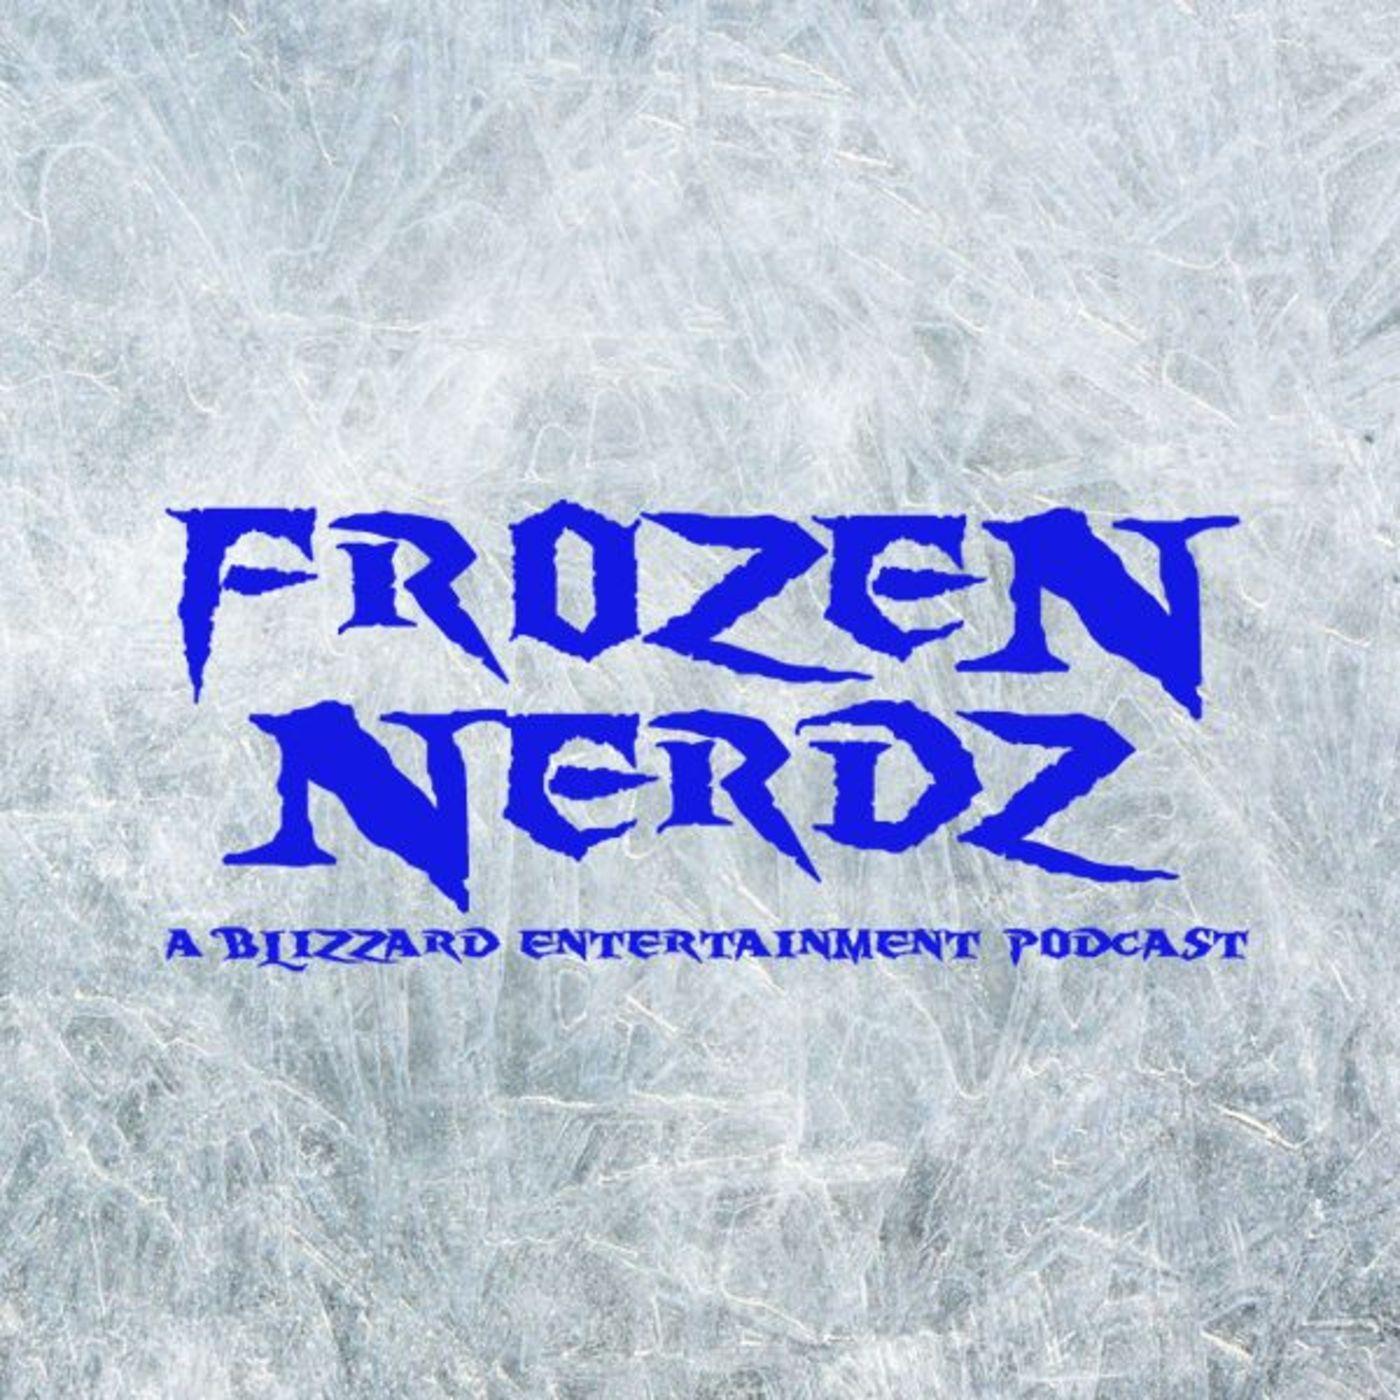 <![CDATA[Frozen Nerdz - A Blizzard Entertainment Discussion Podcast]]>